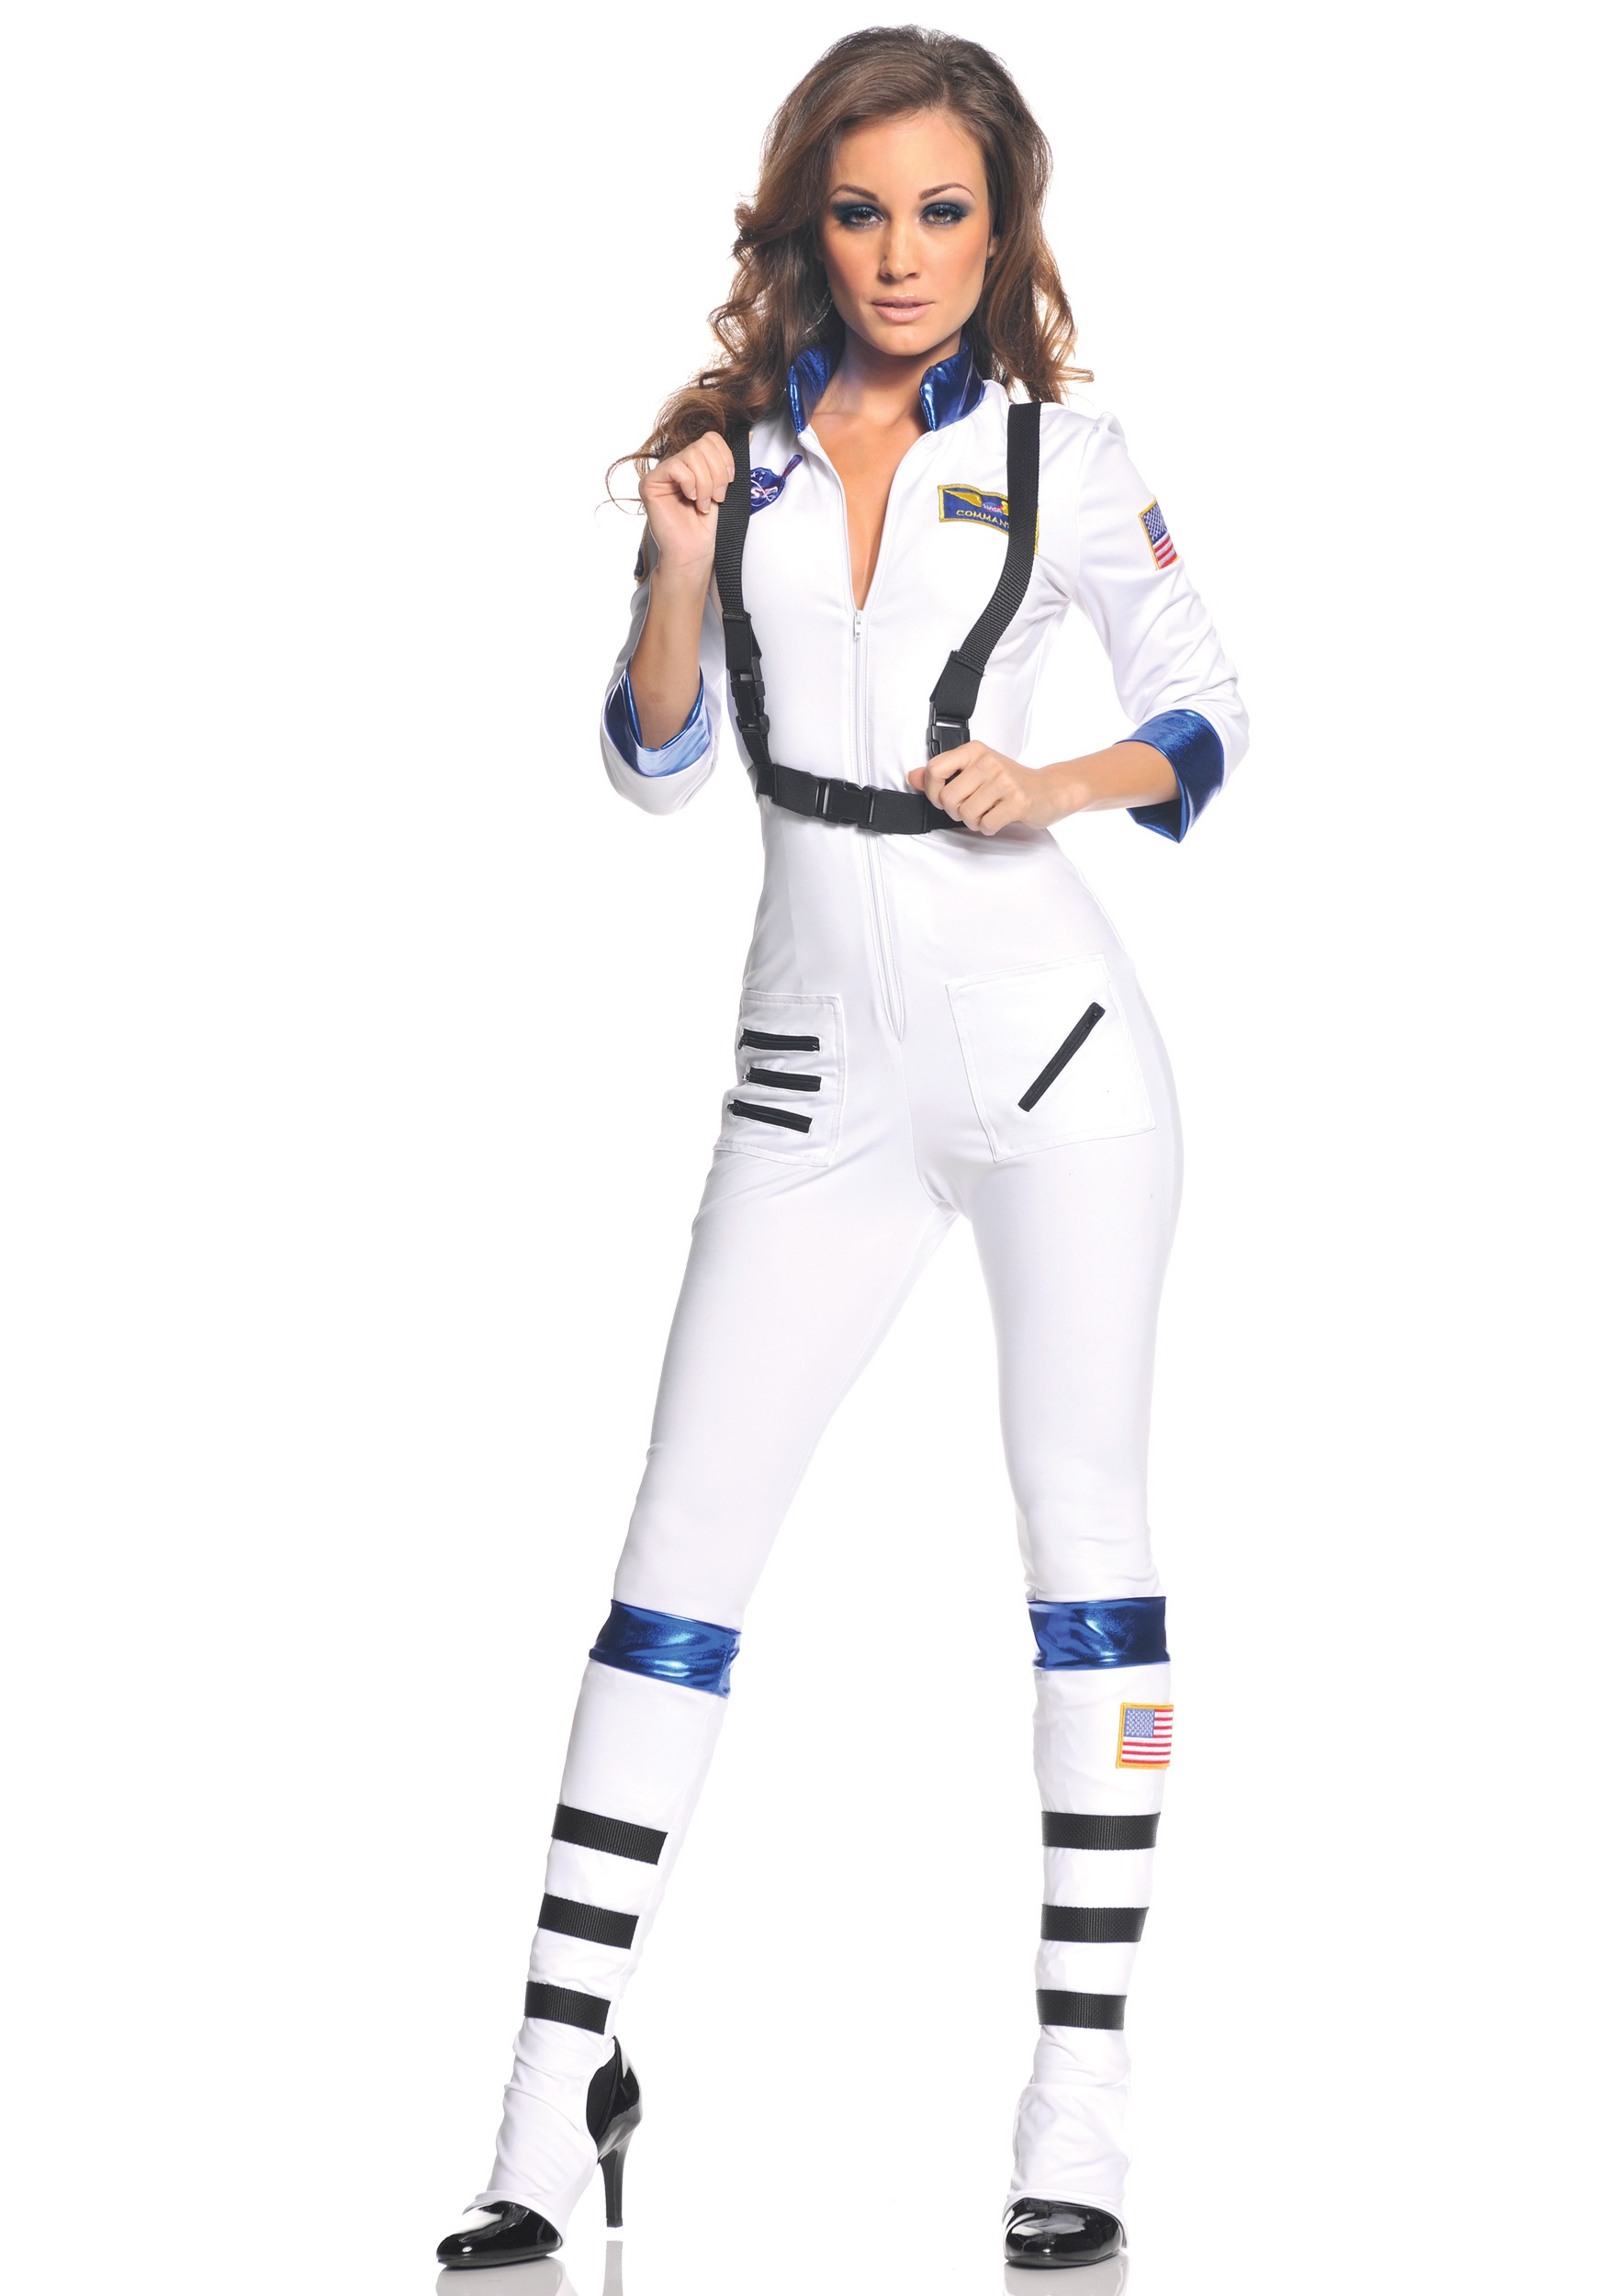 hot women astronauts - photo #15